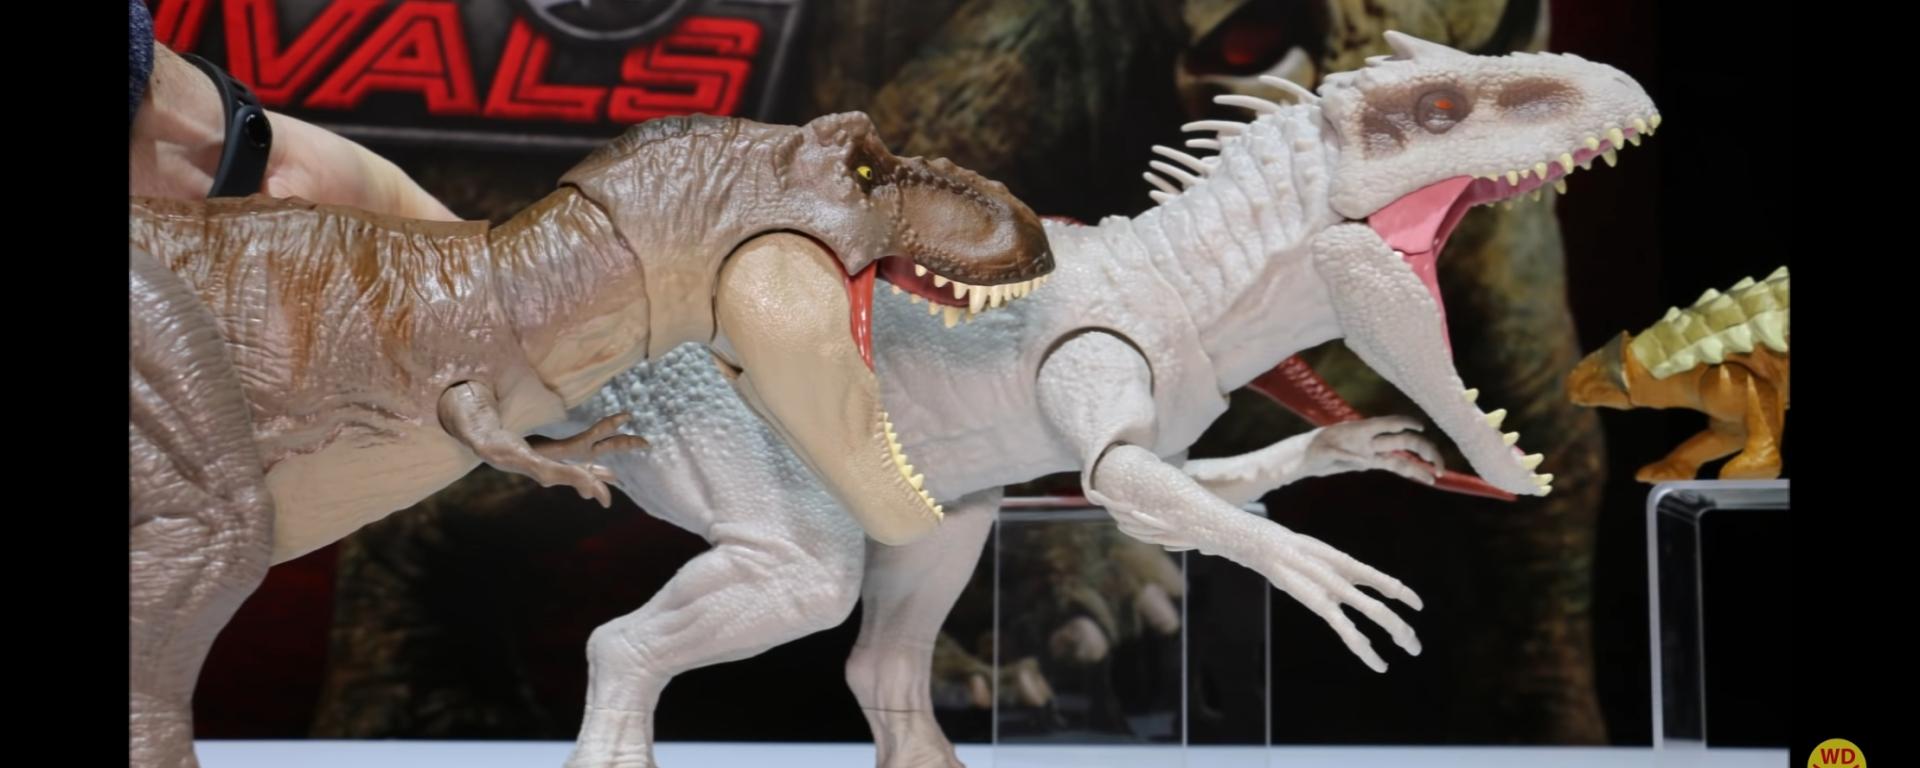 Mattel Reveals the Destroy N Devour Indominus Rex